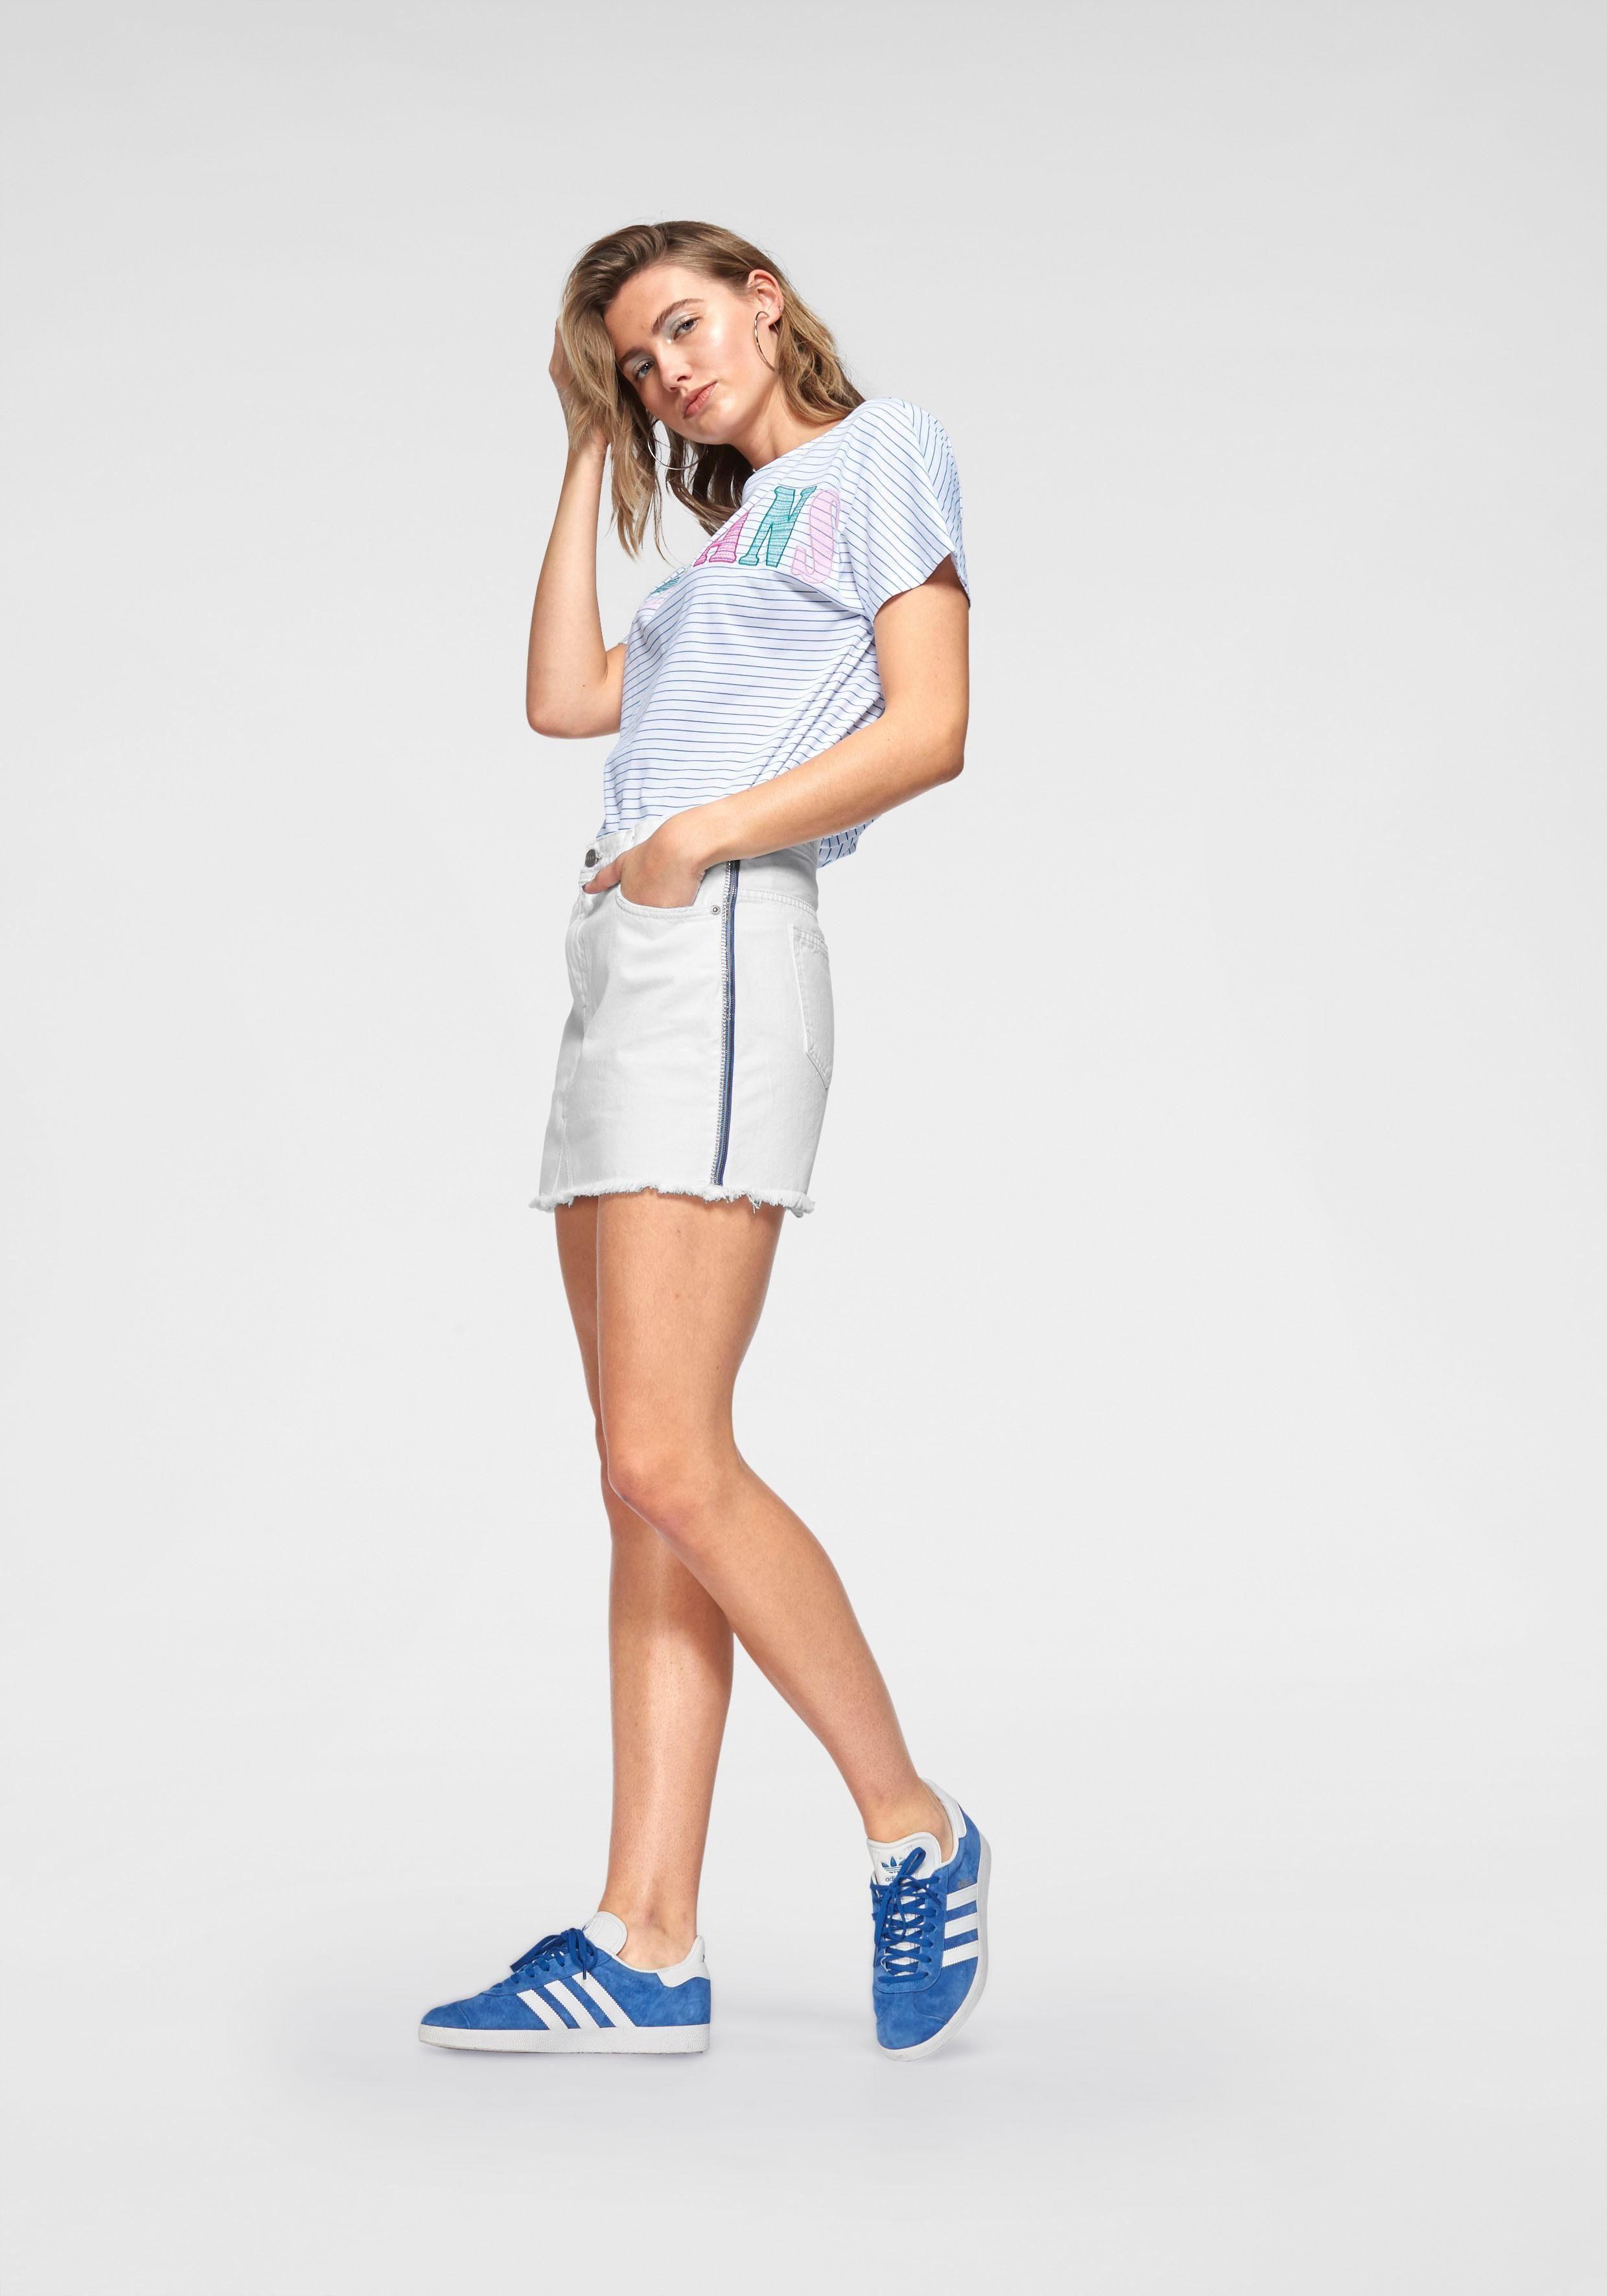 Logo Großer applikation T Pepe »leona« Mit shirt Jeans q41Tx8Y